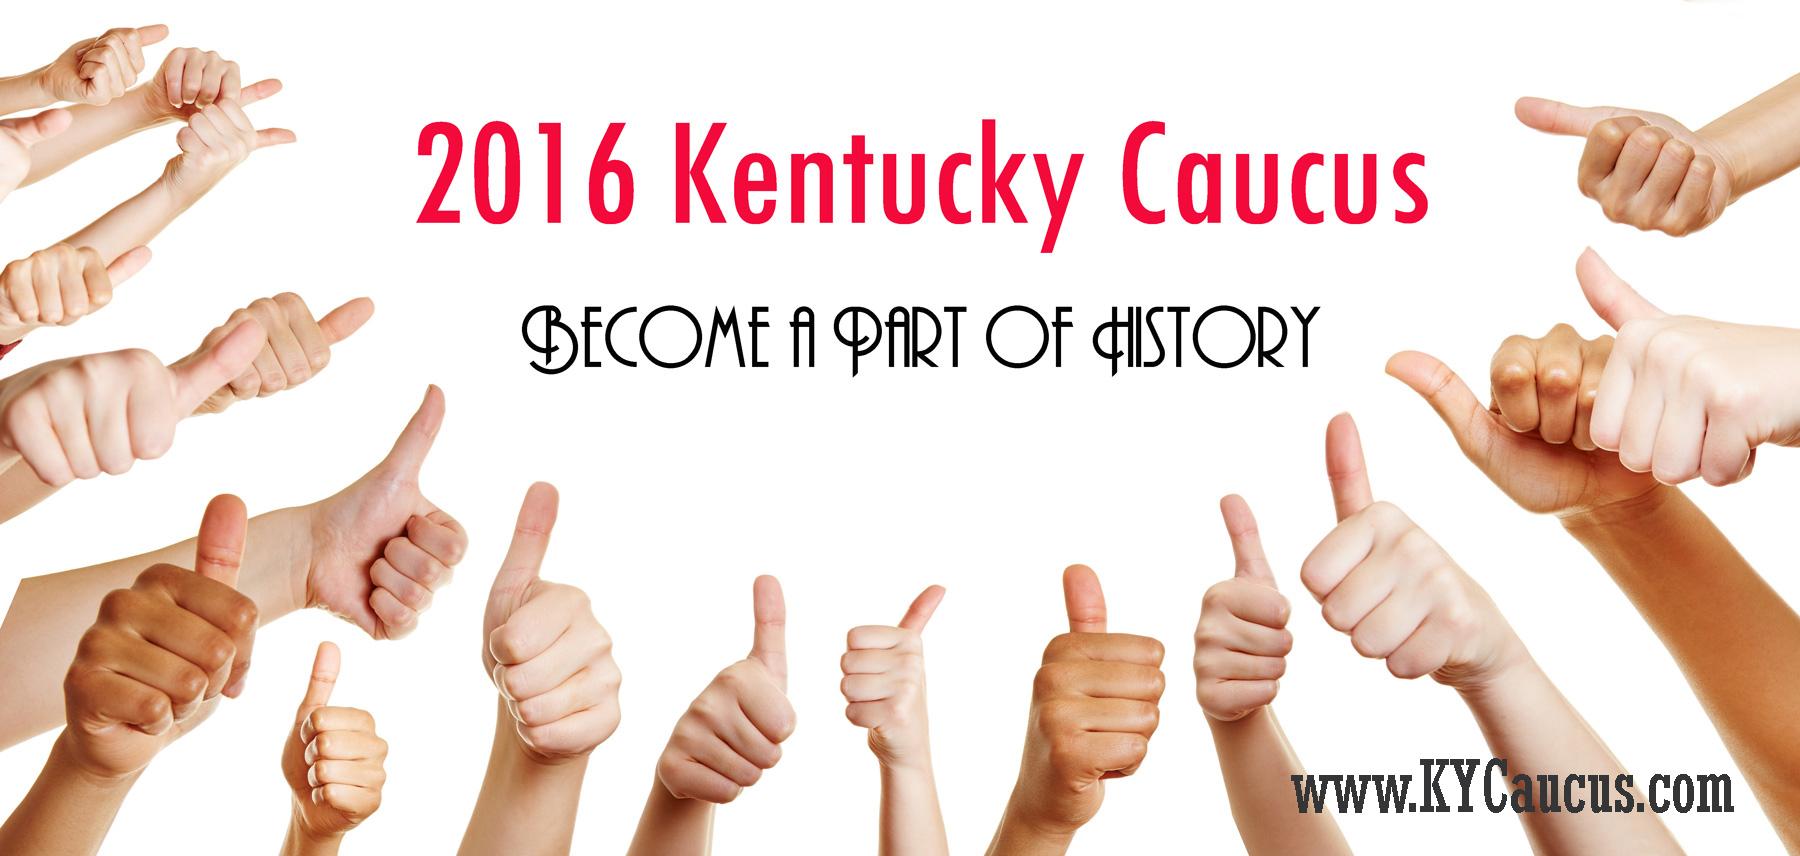 Kentucky Caucus Logo